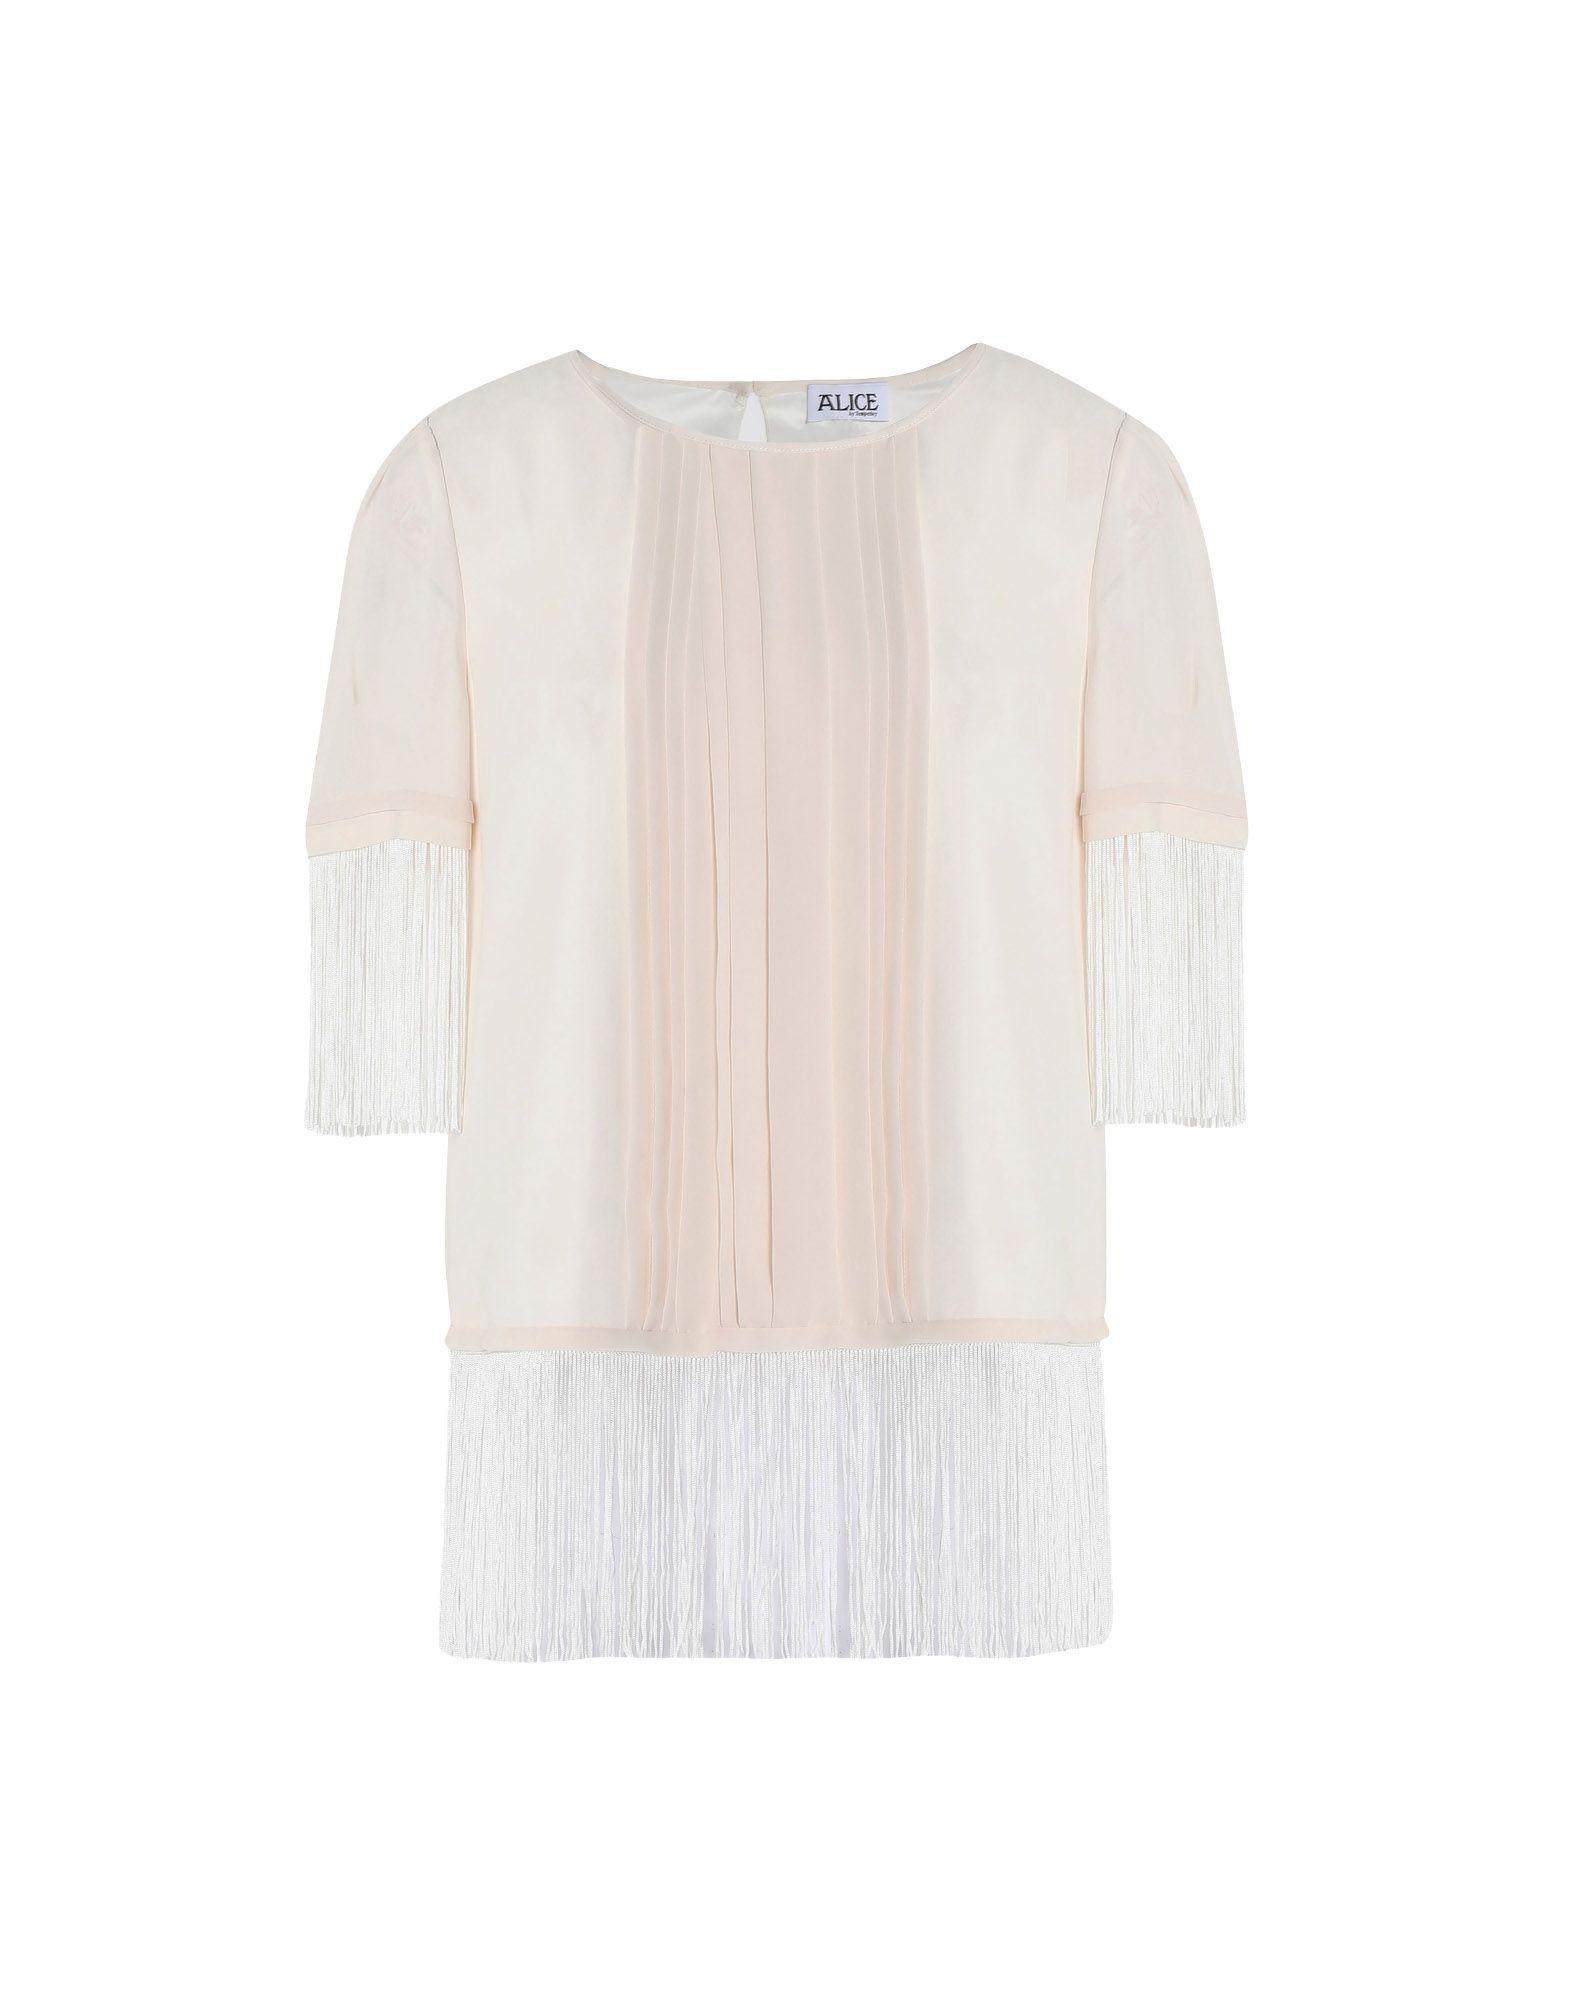 ALICE by TEMPERLEY Блузка платье alice by temperley платья и сарафаны макси длинные